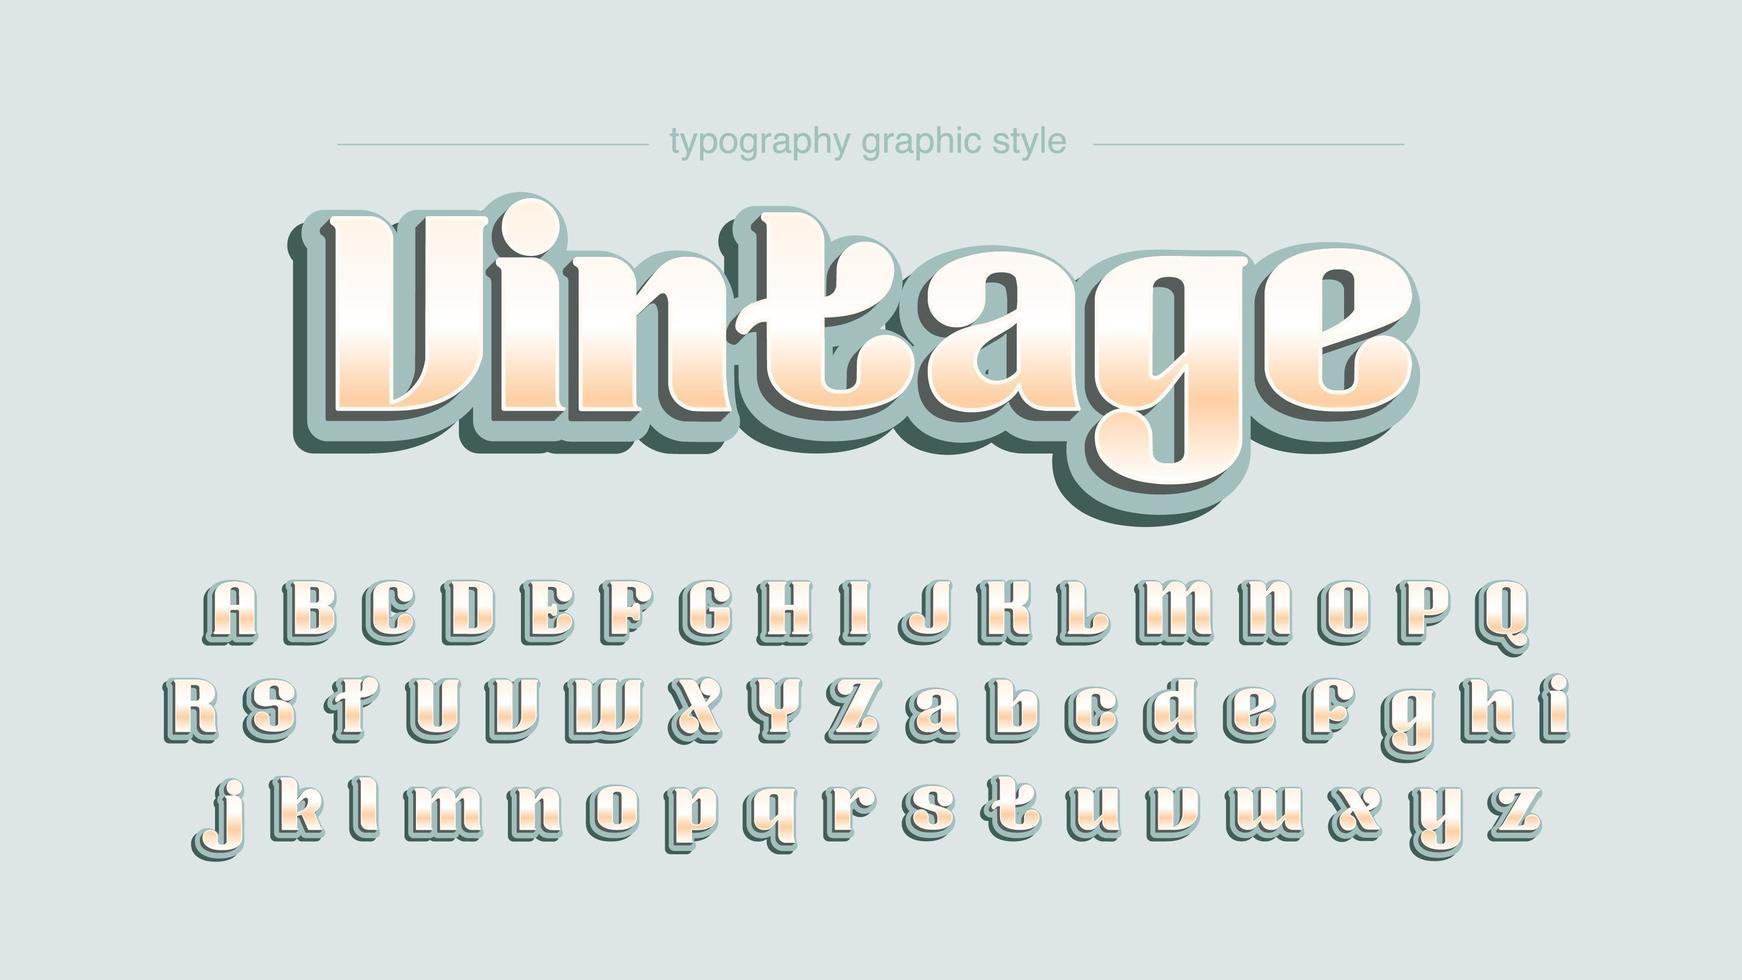 Tipografía de pantalla redondeada vintage vector